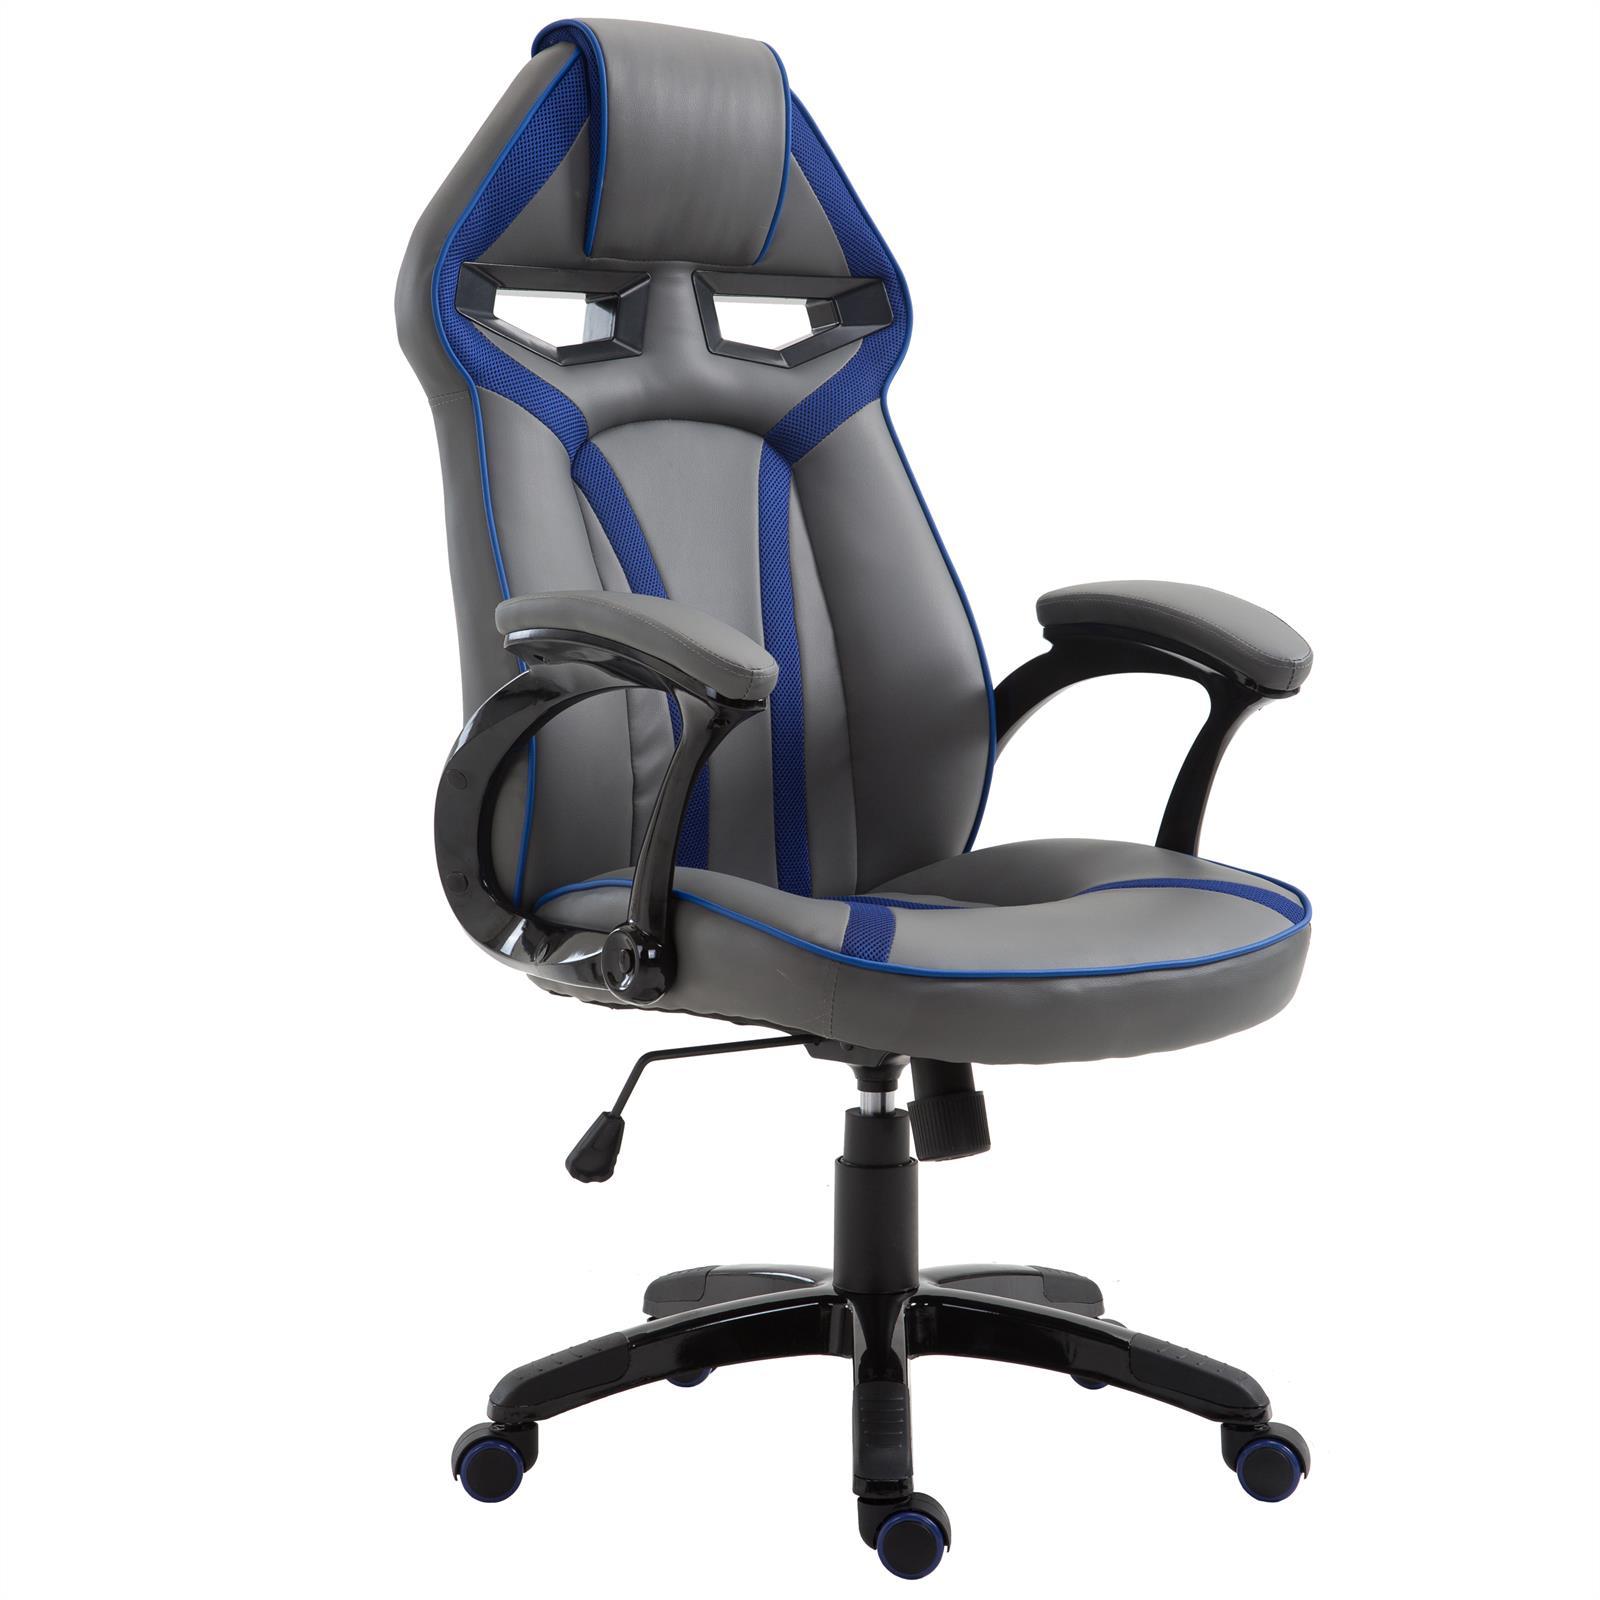 Chaise-de-bureau-SPEEDY-fauteuil-gamer-chair-style-racing-racer-siege